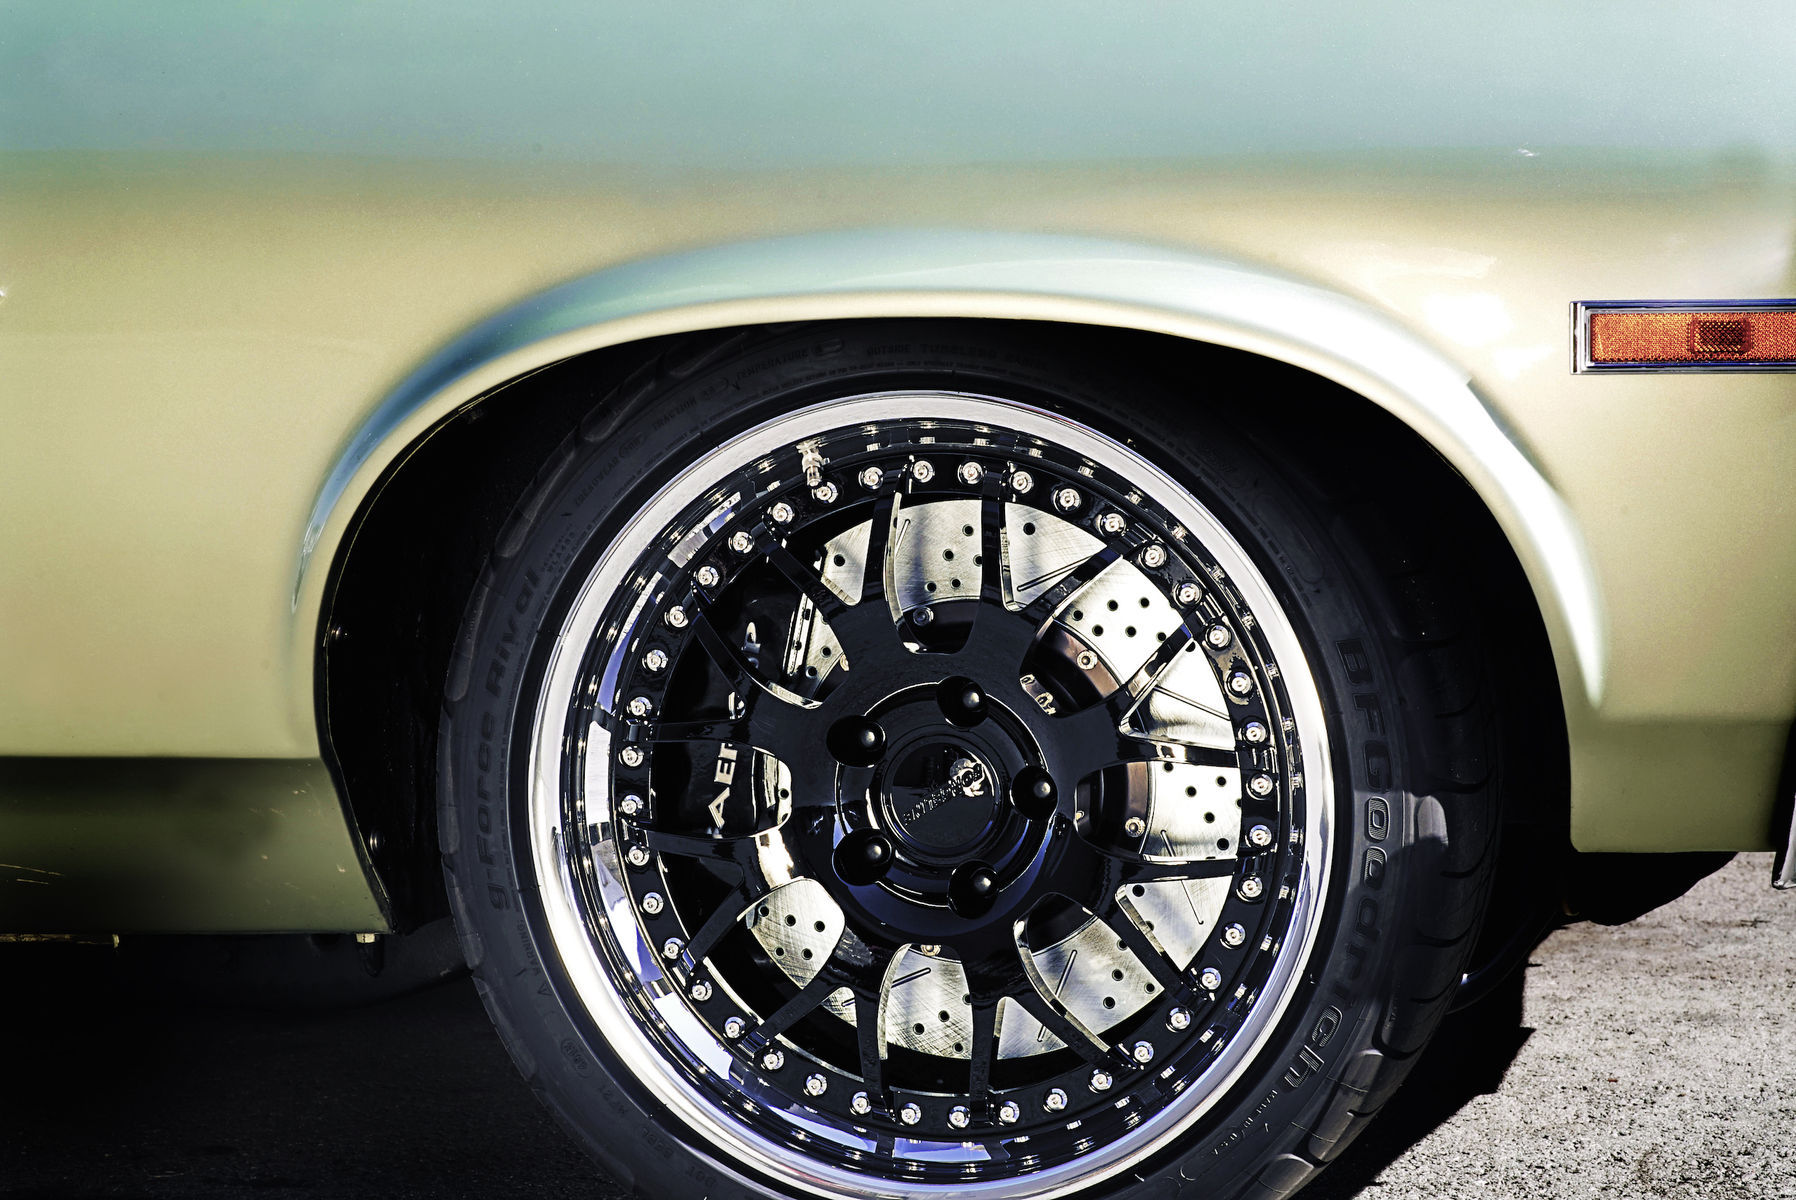 1971 Chevrolet Nova | Edgar's Nova on Forgeline WC3 Wheels